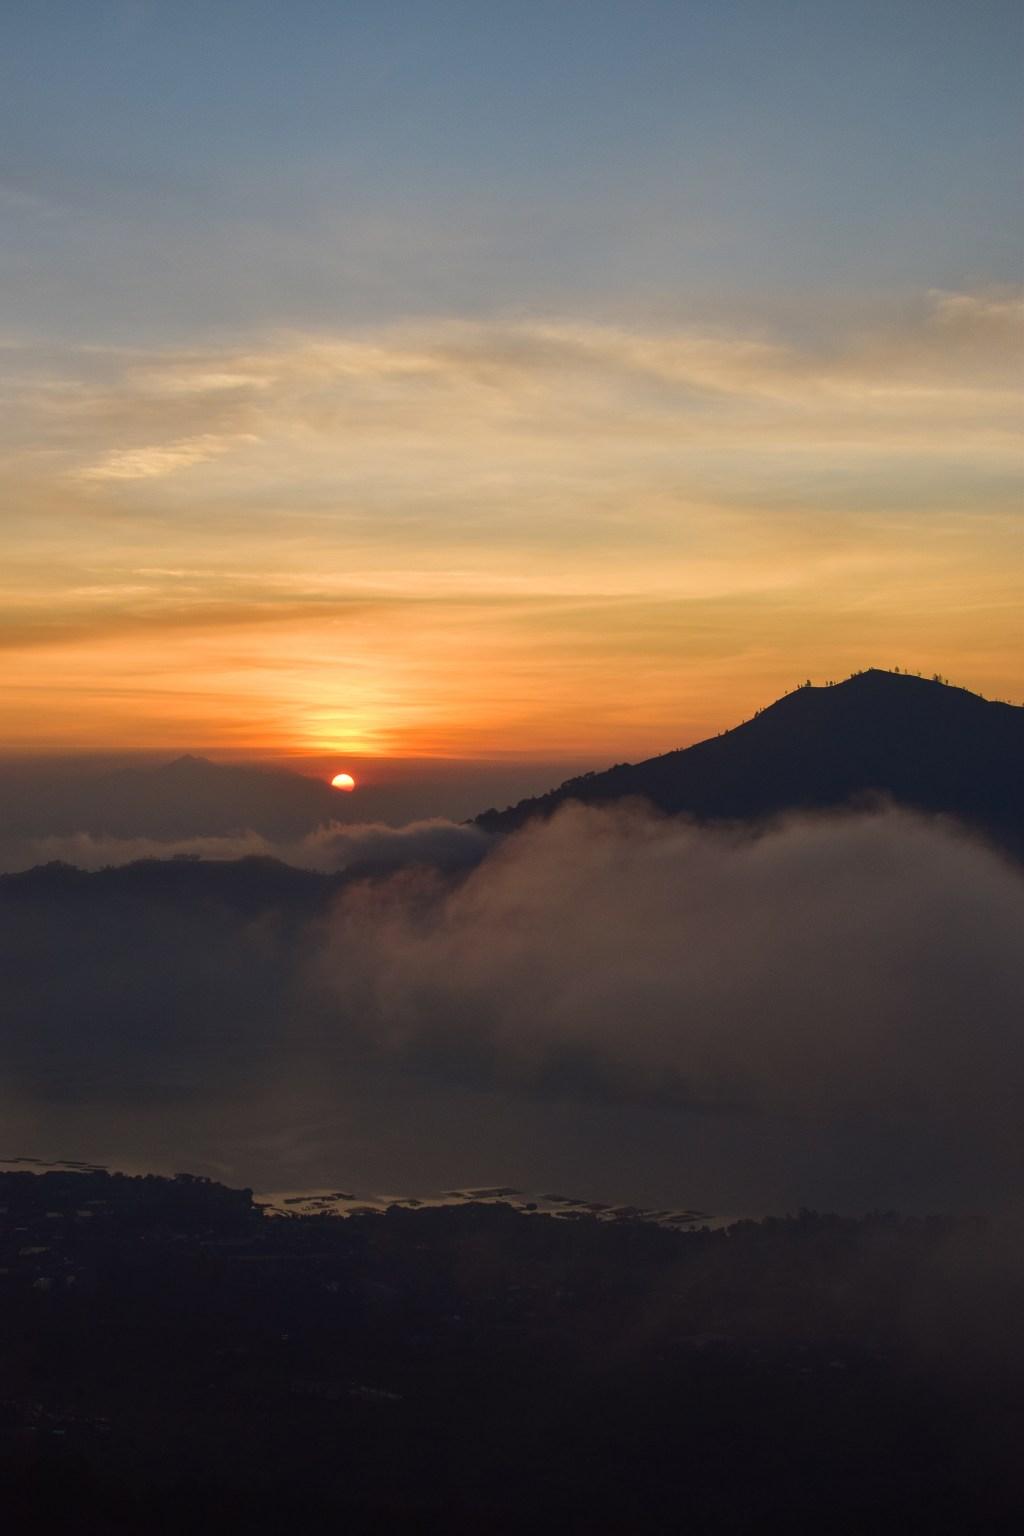 solen går upp vid horisonten vid mount agung.